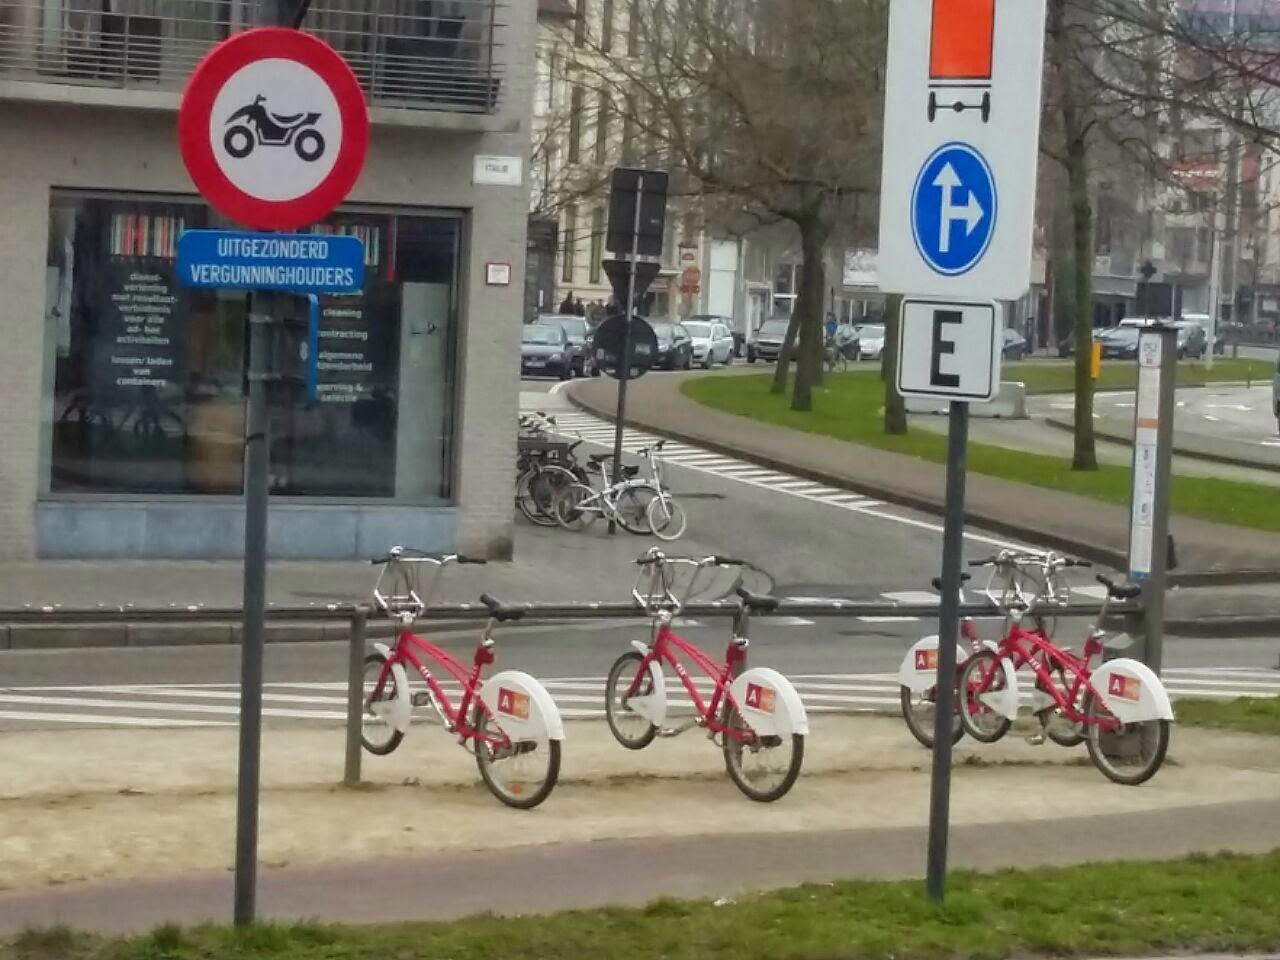 Persewaan sepeda untuk keliling di Antwerp